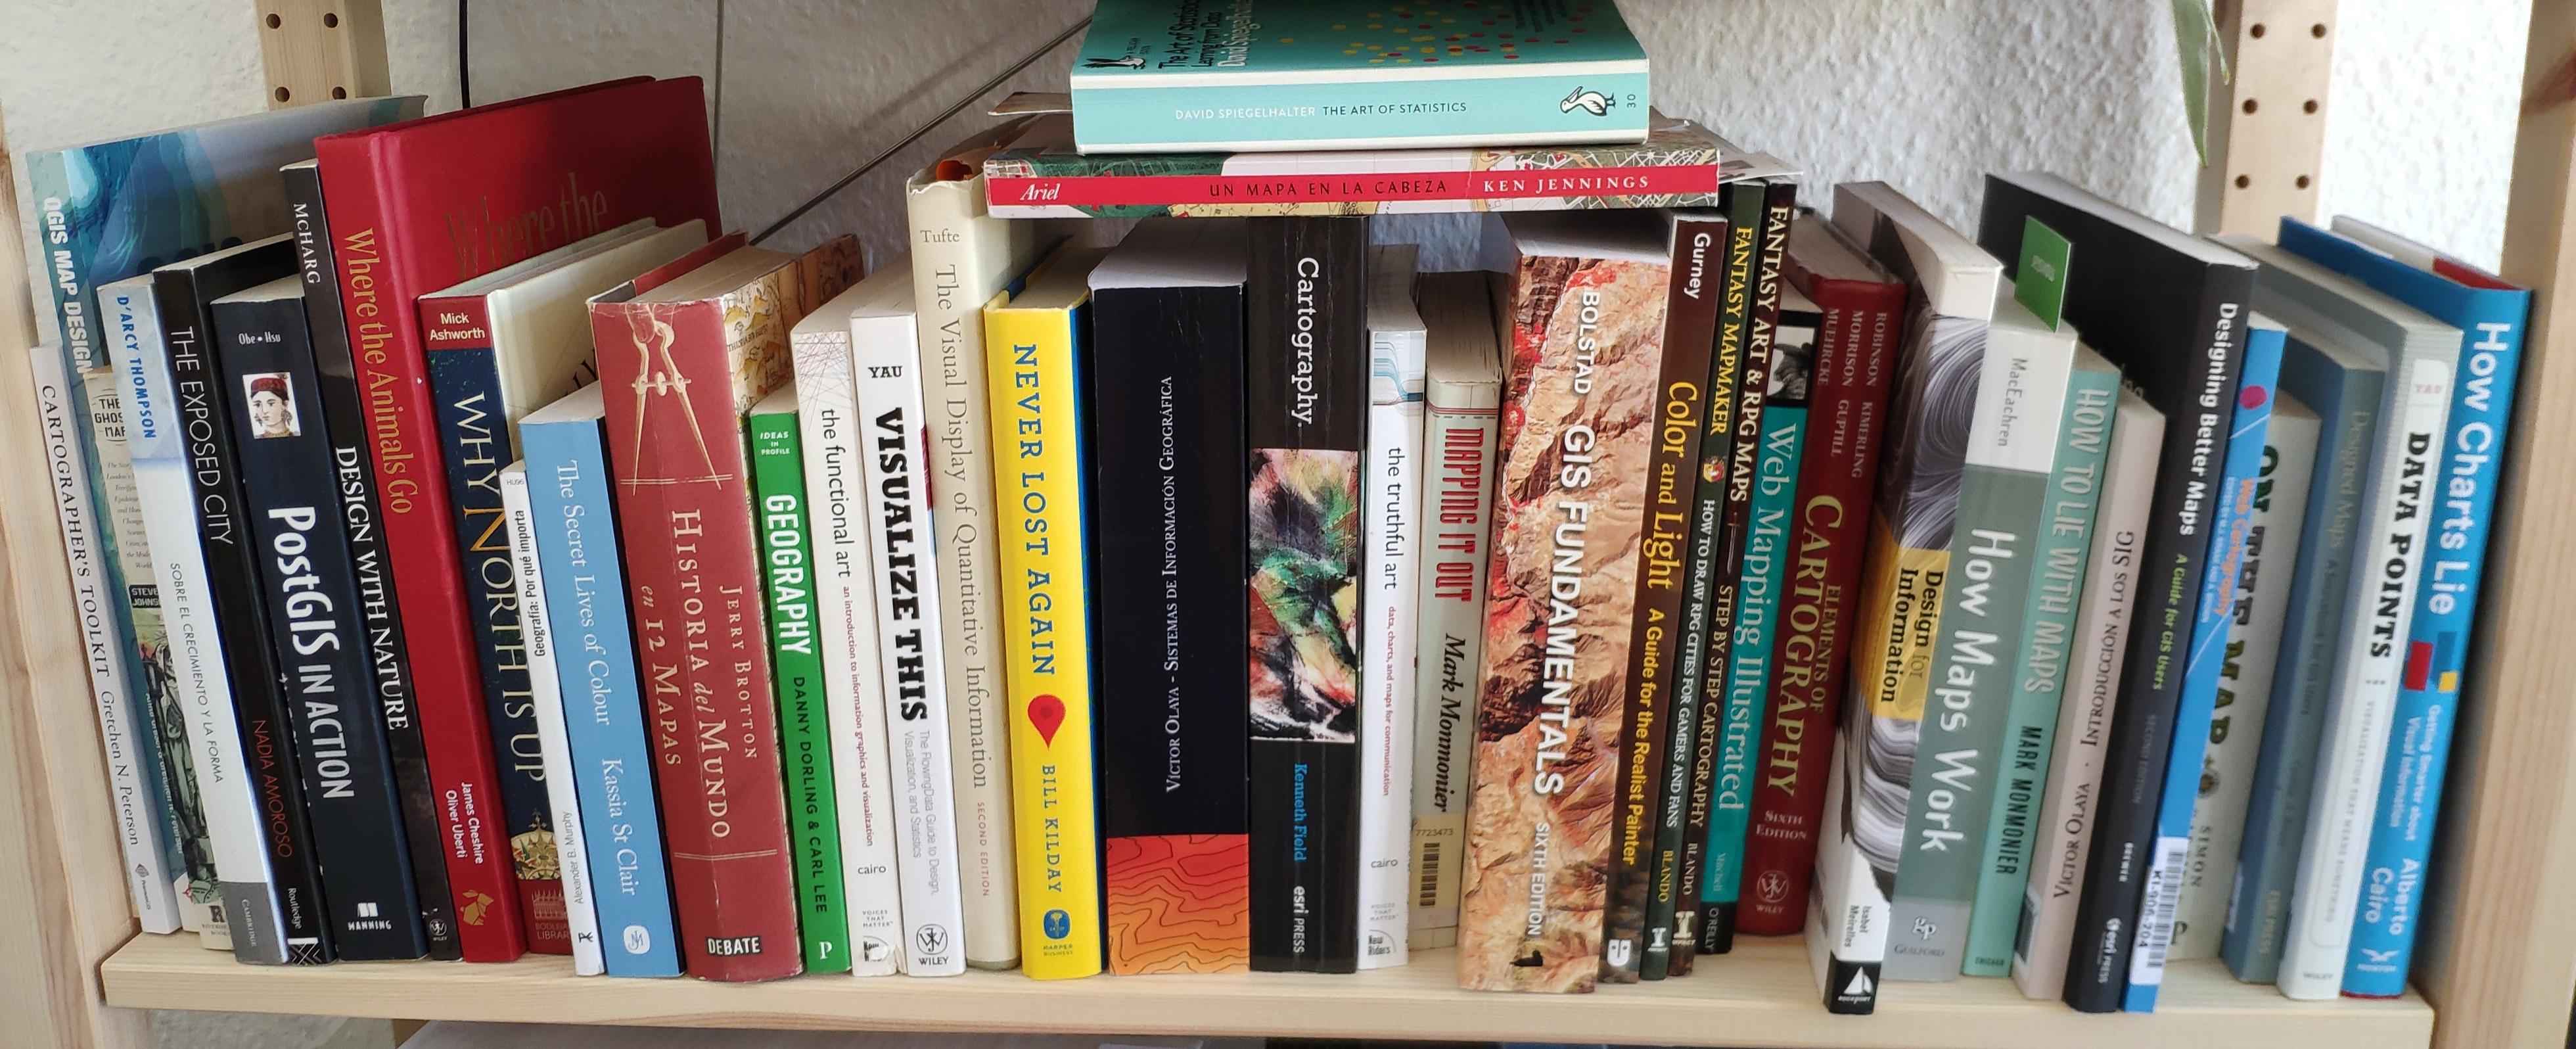 cartography-books-shelve